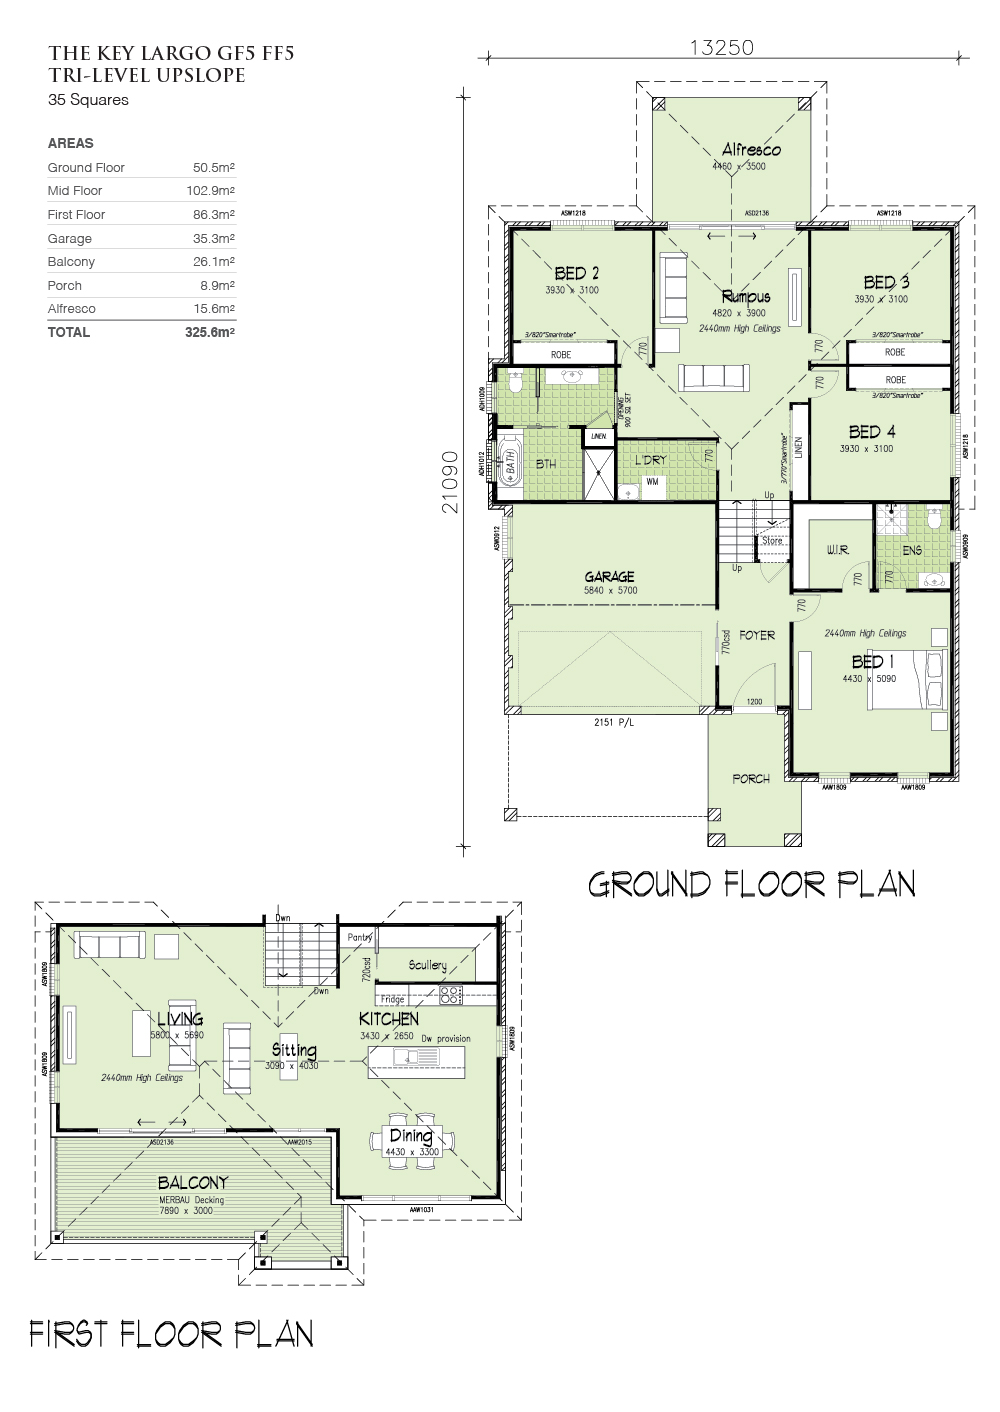 Keylargo GF5 FF5, Home Design, Tullipan Homes